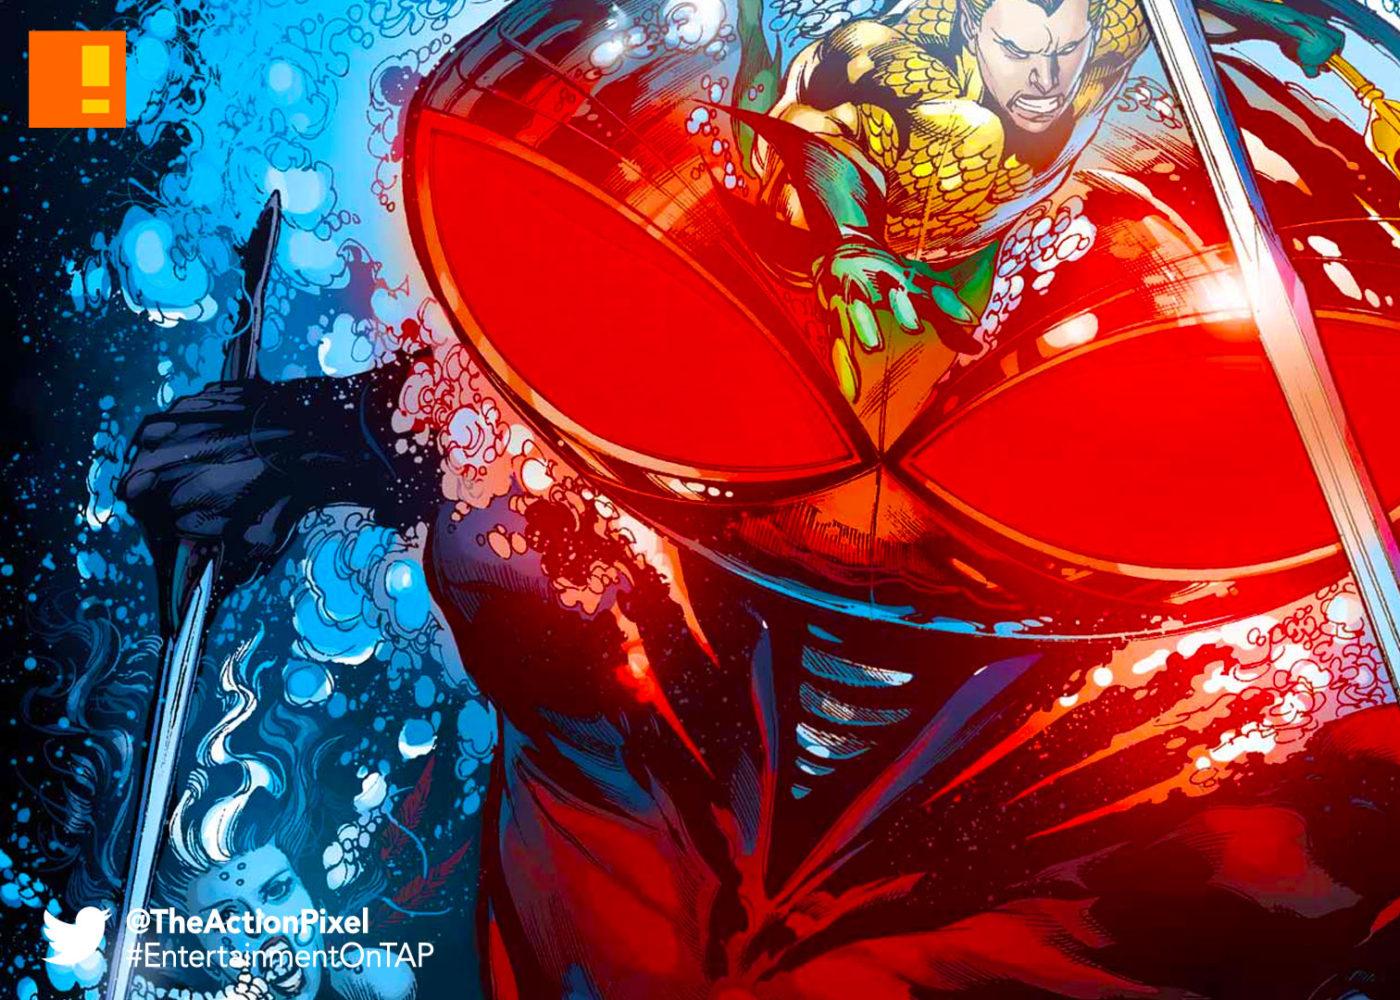 black manta, aquaman, the action pixel, entertainment on tap,dc comics